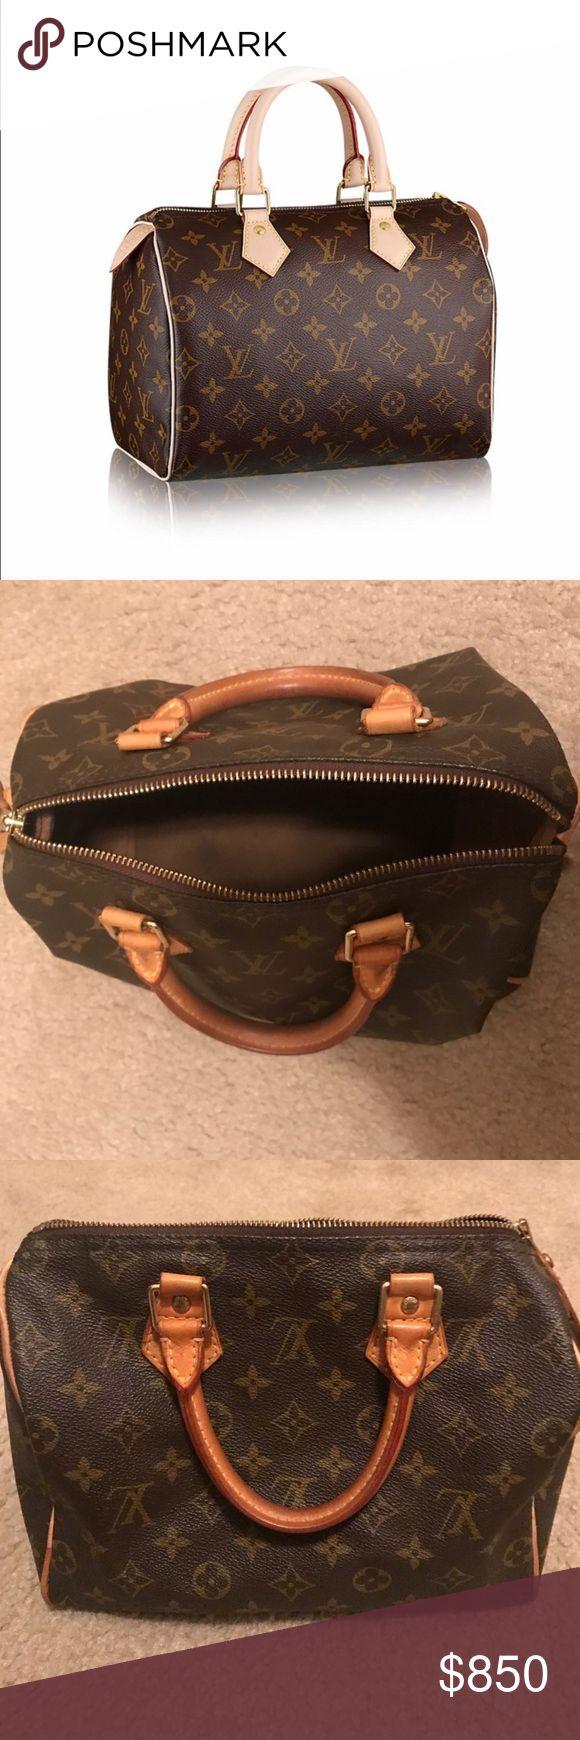 Louis Vuitton Speedy 25 M40091 Louis Vuitton Bags Totes